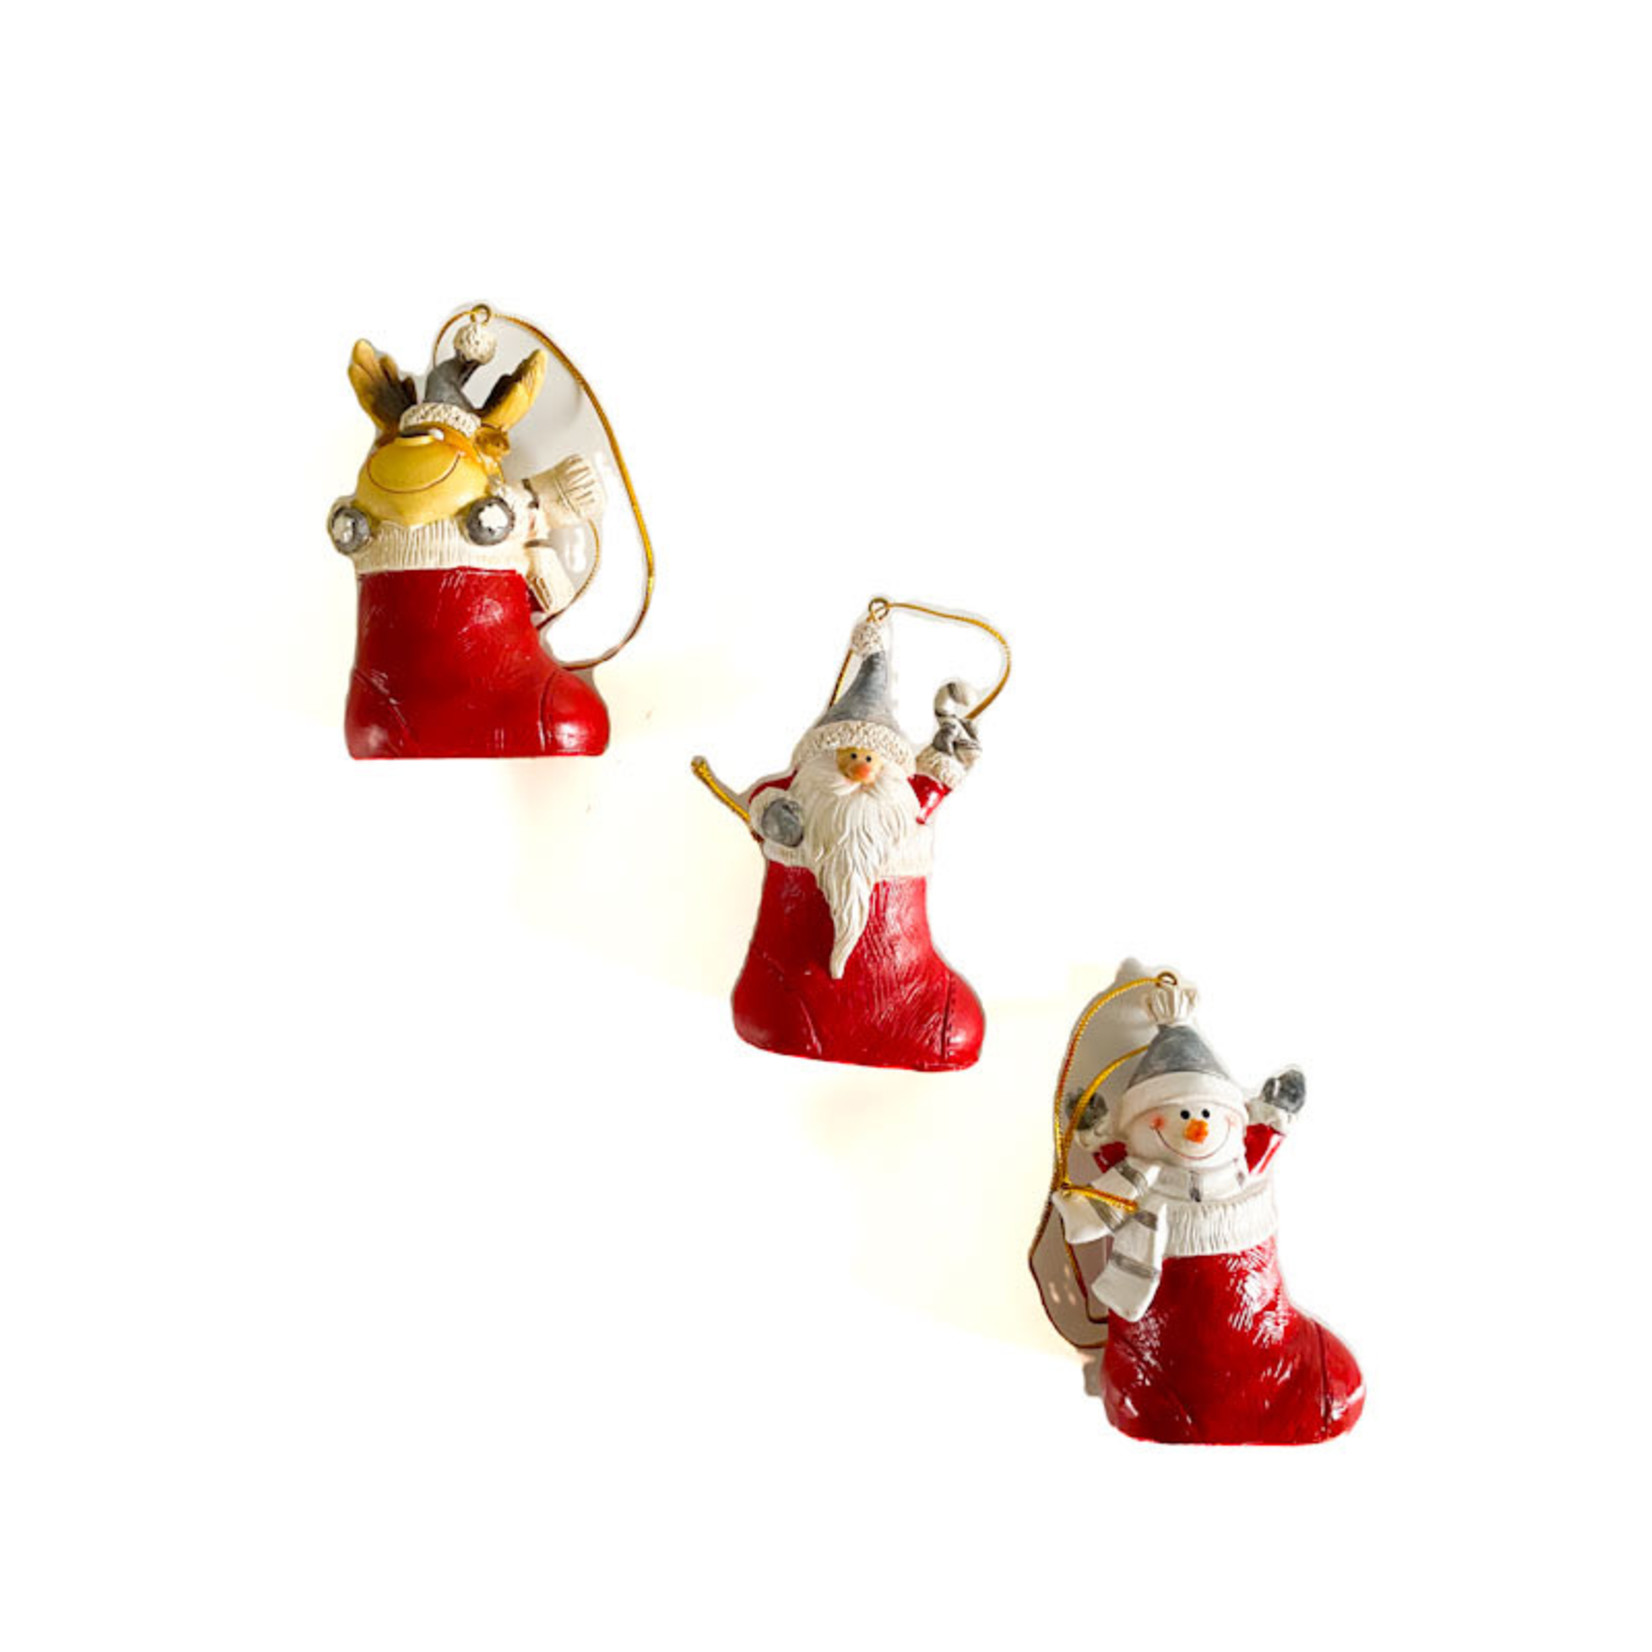 Ornament - Santa/Snowman/Deer in Stocking